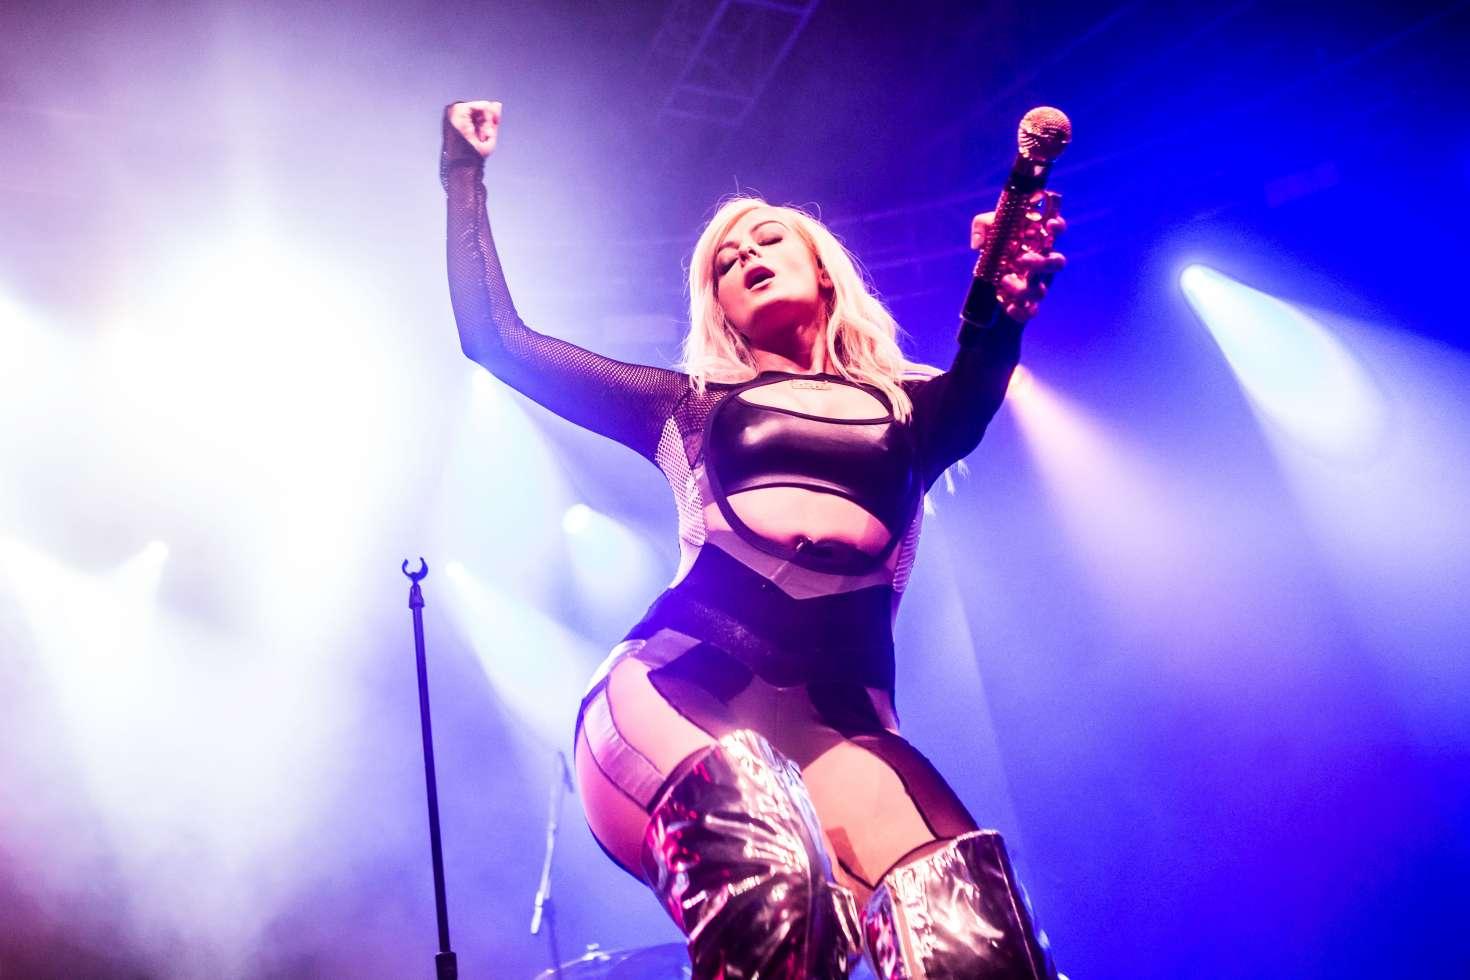 Bebe Rexha - Performing in concert at Fabrique in Milan